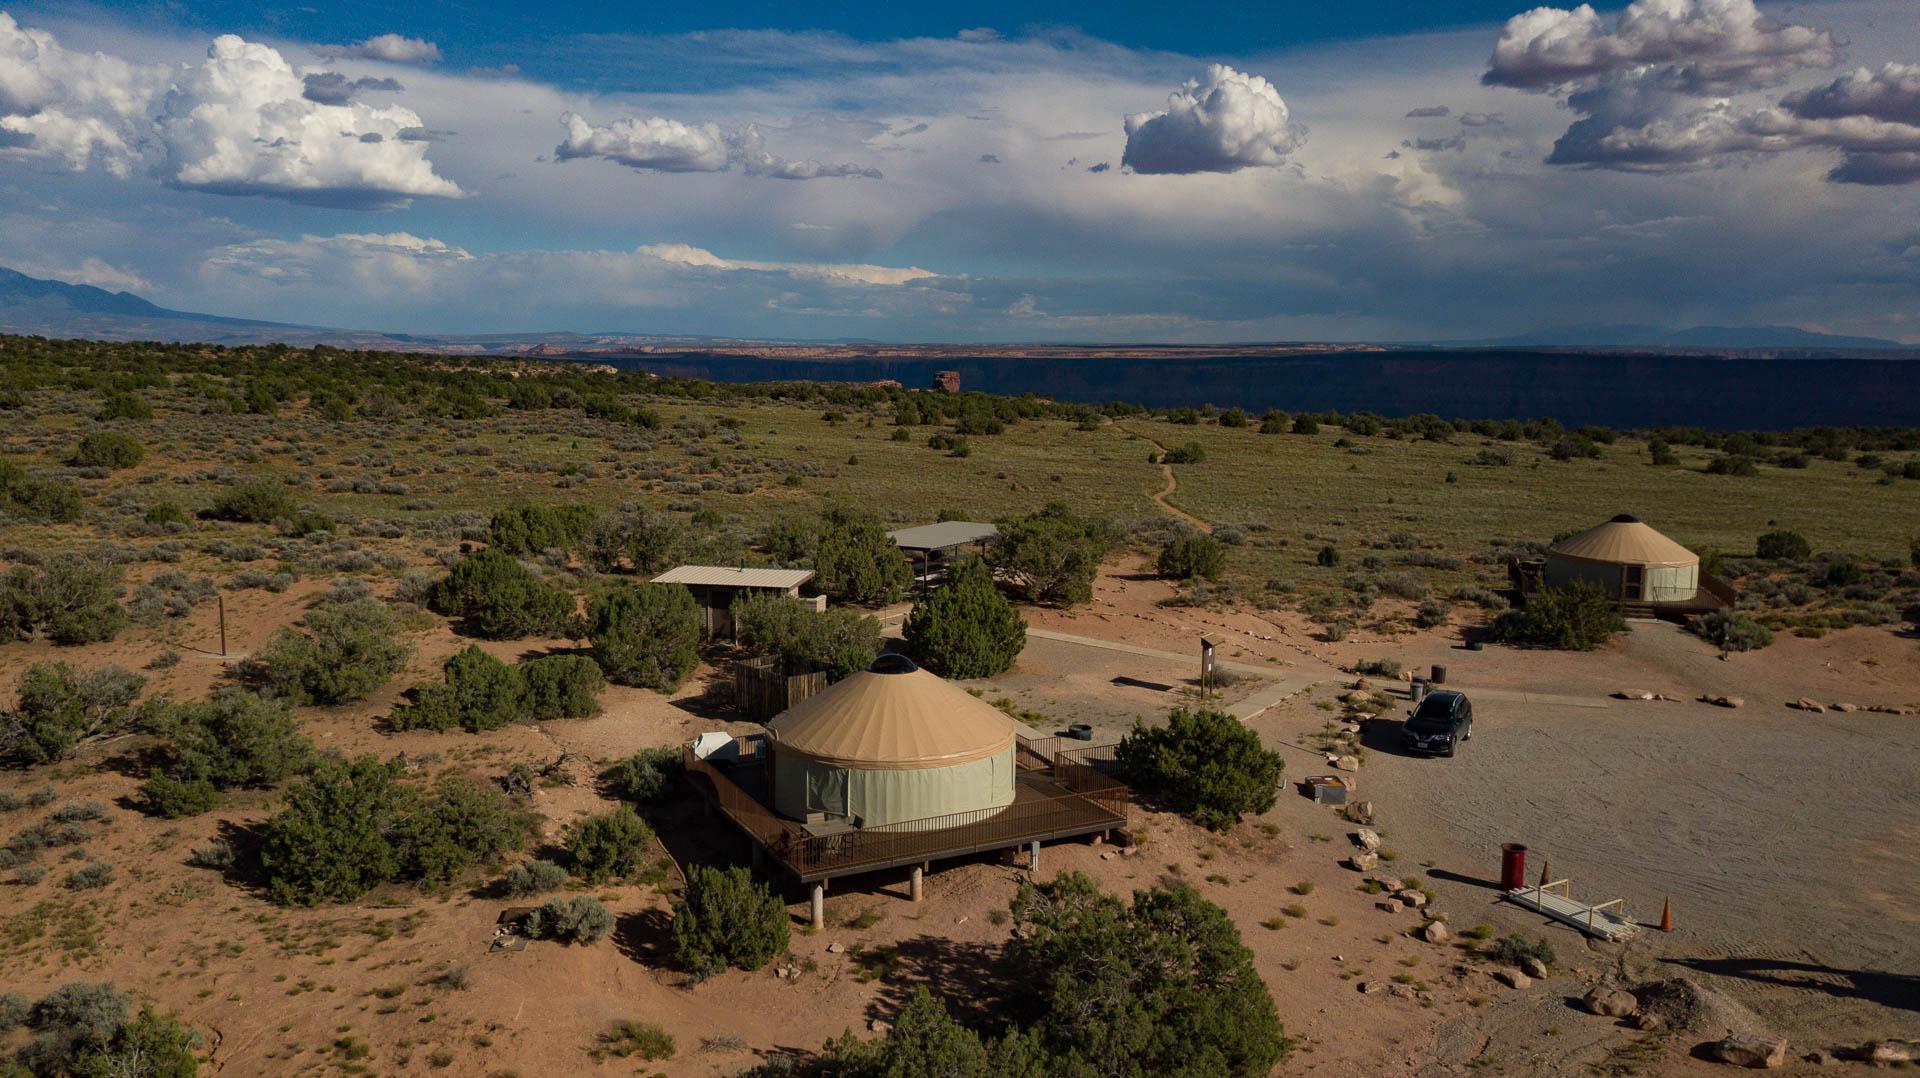 yurt-drone